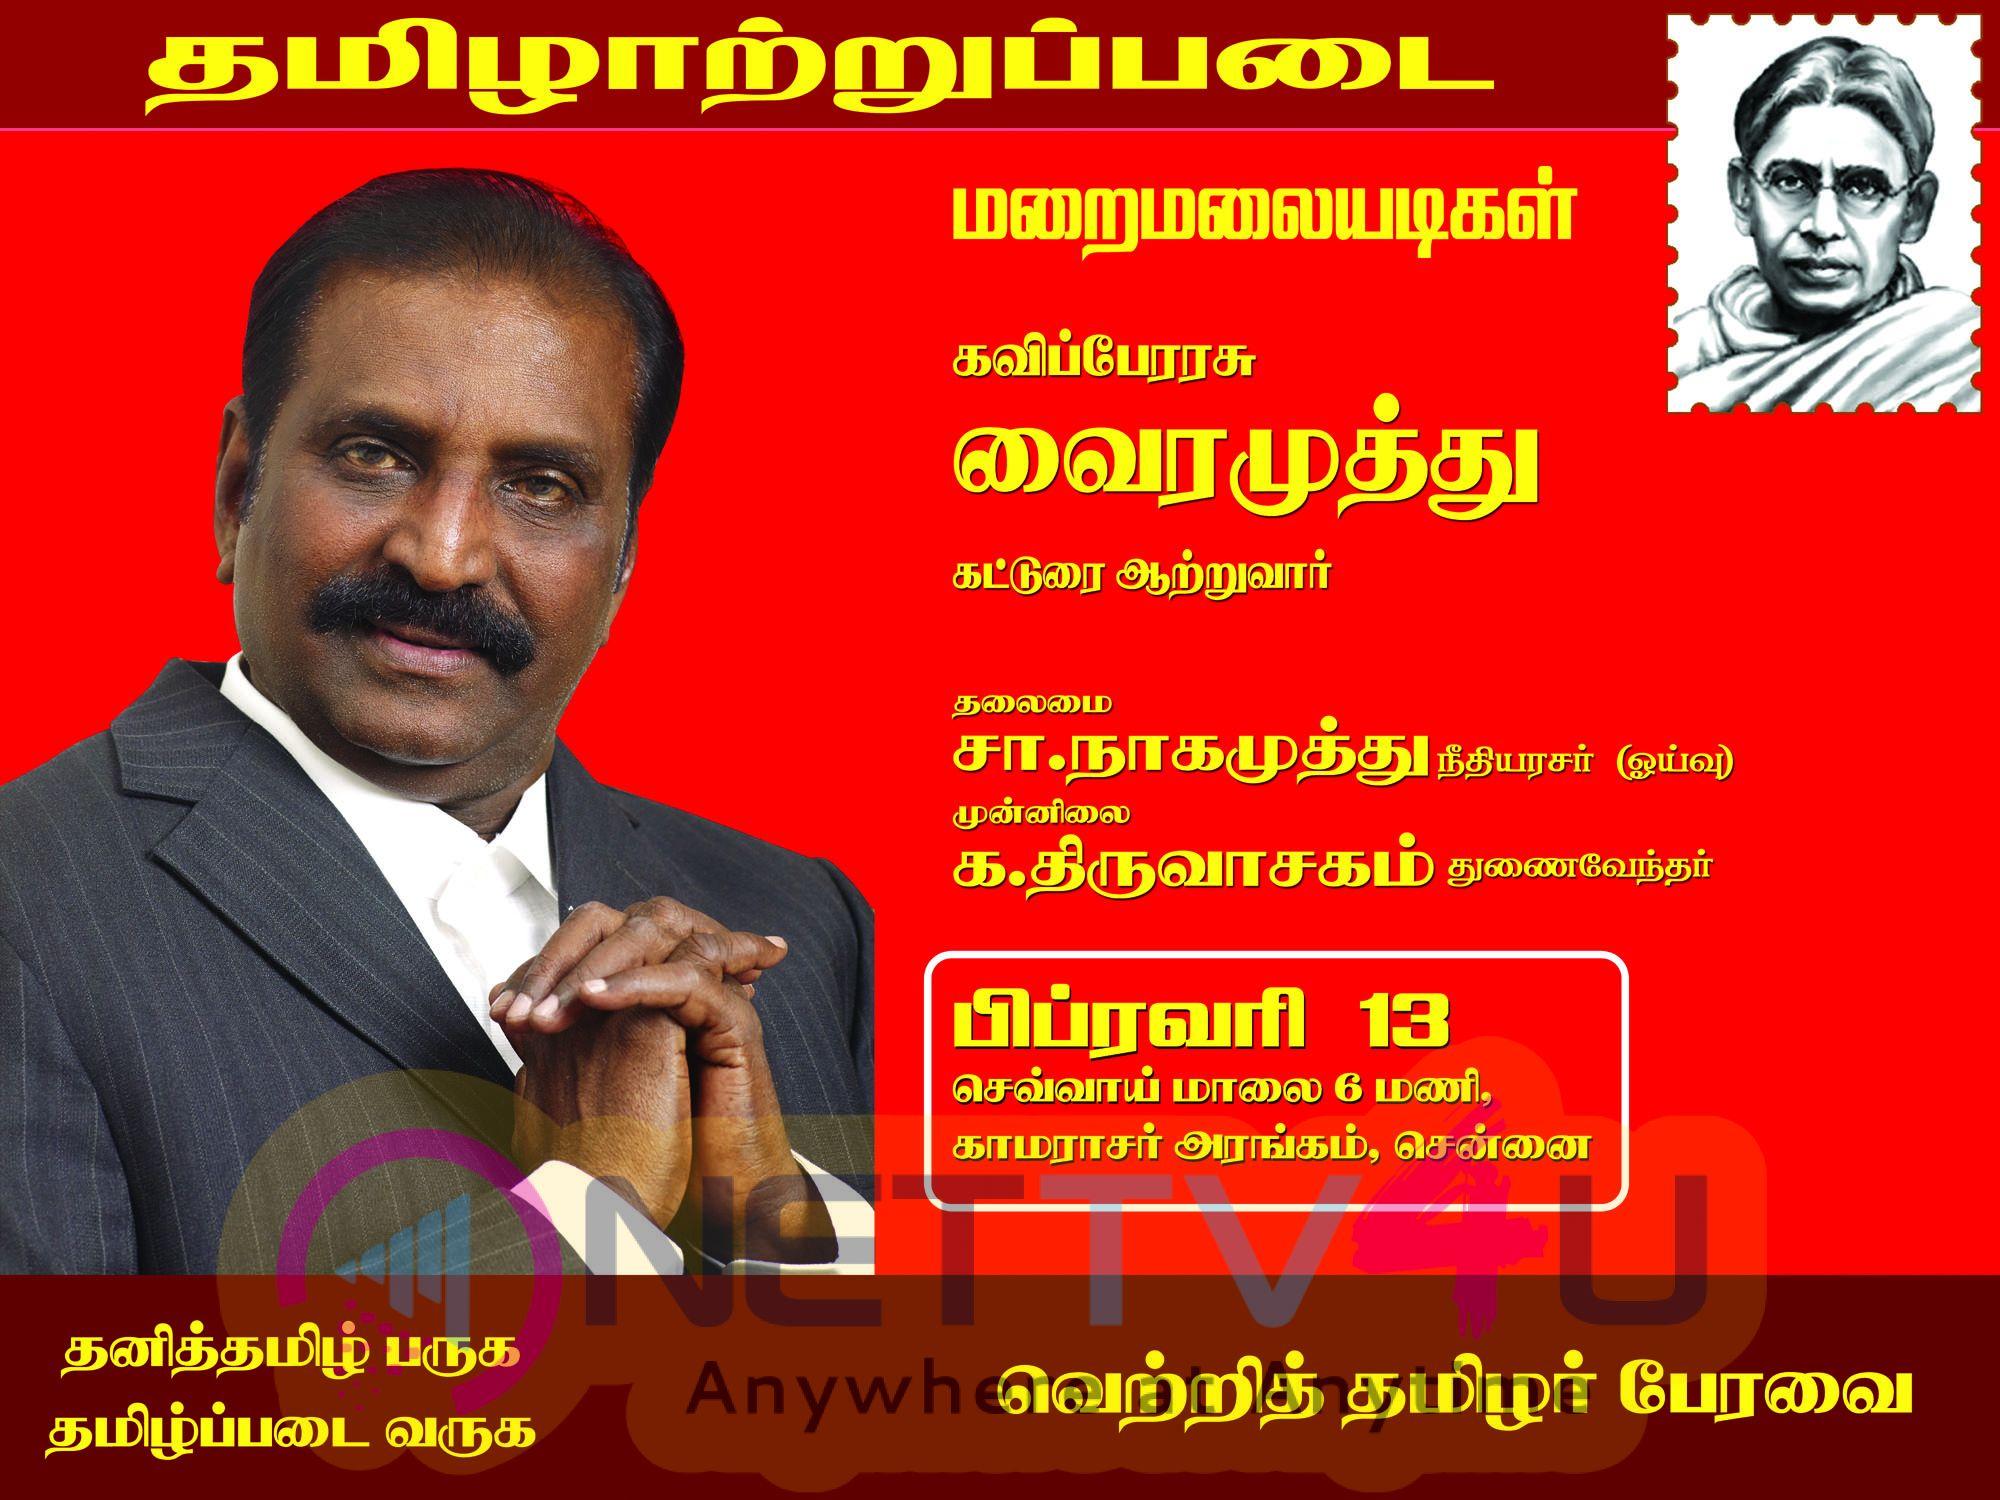 Kaviperarasu Vairamuthu To Speak About Maraimalai Adigal In Tamil Estrupada  Event Invitation